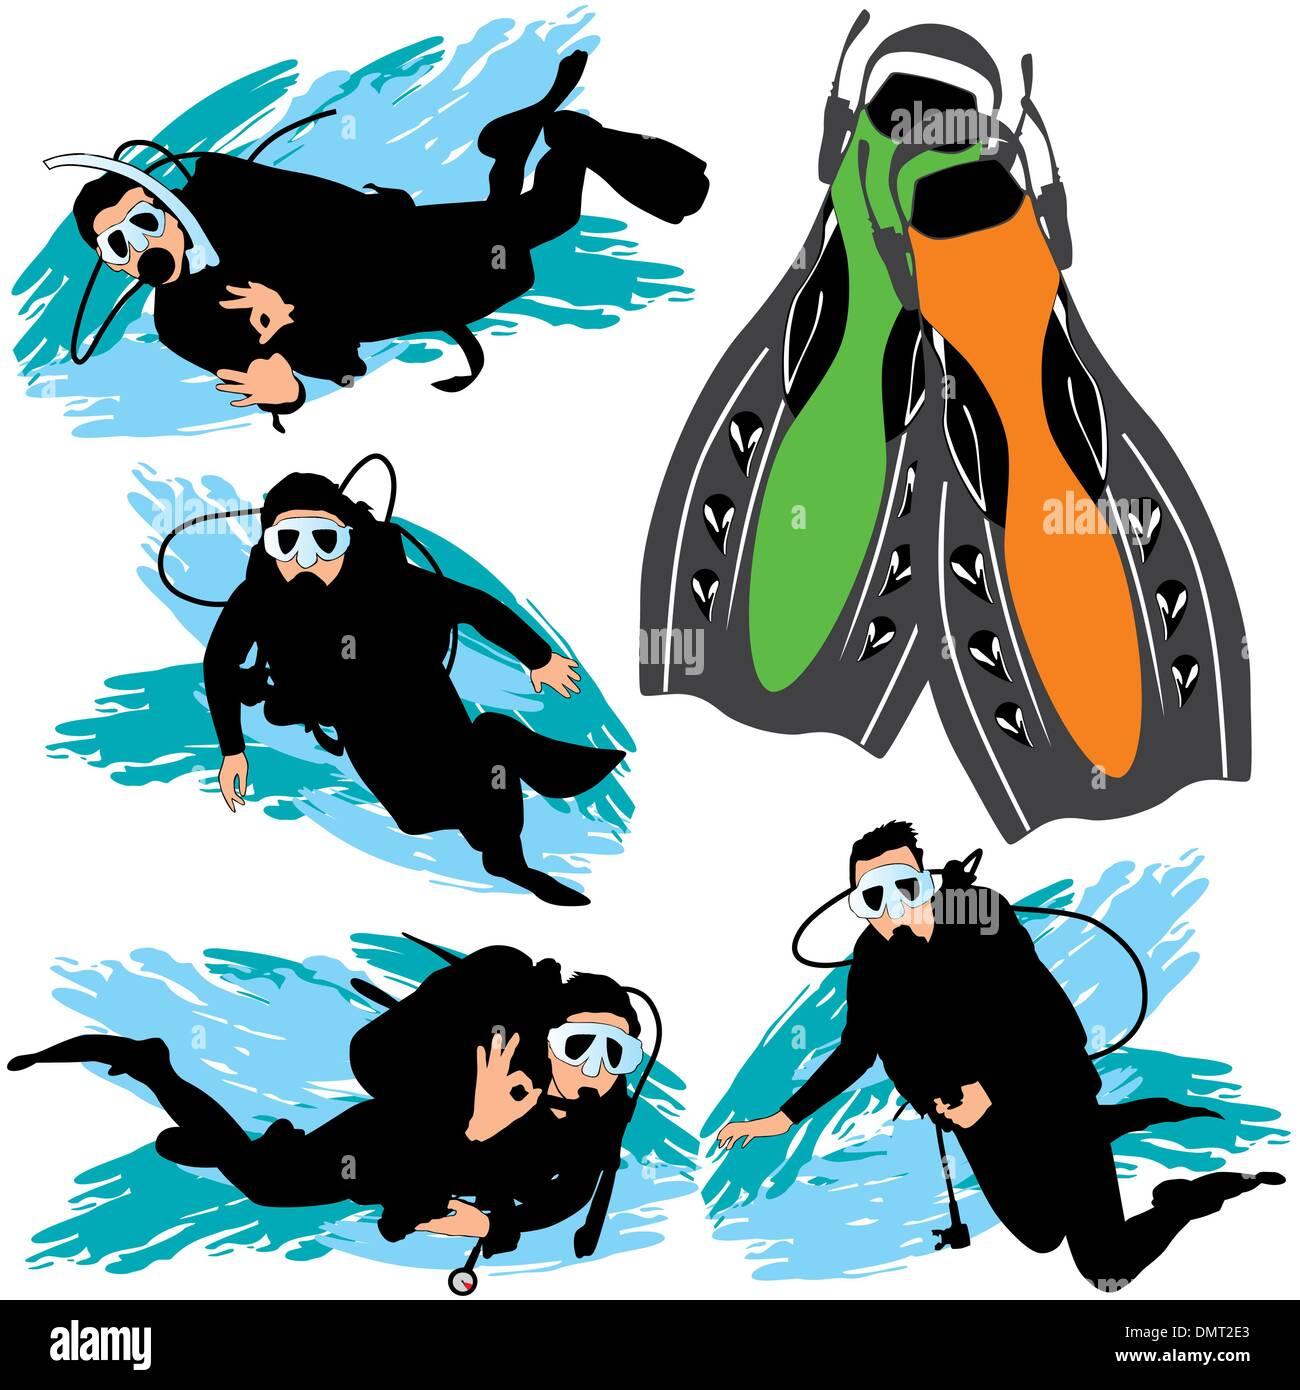 Scuba Diving Silhouettes Set - Stock Image